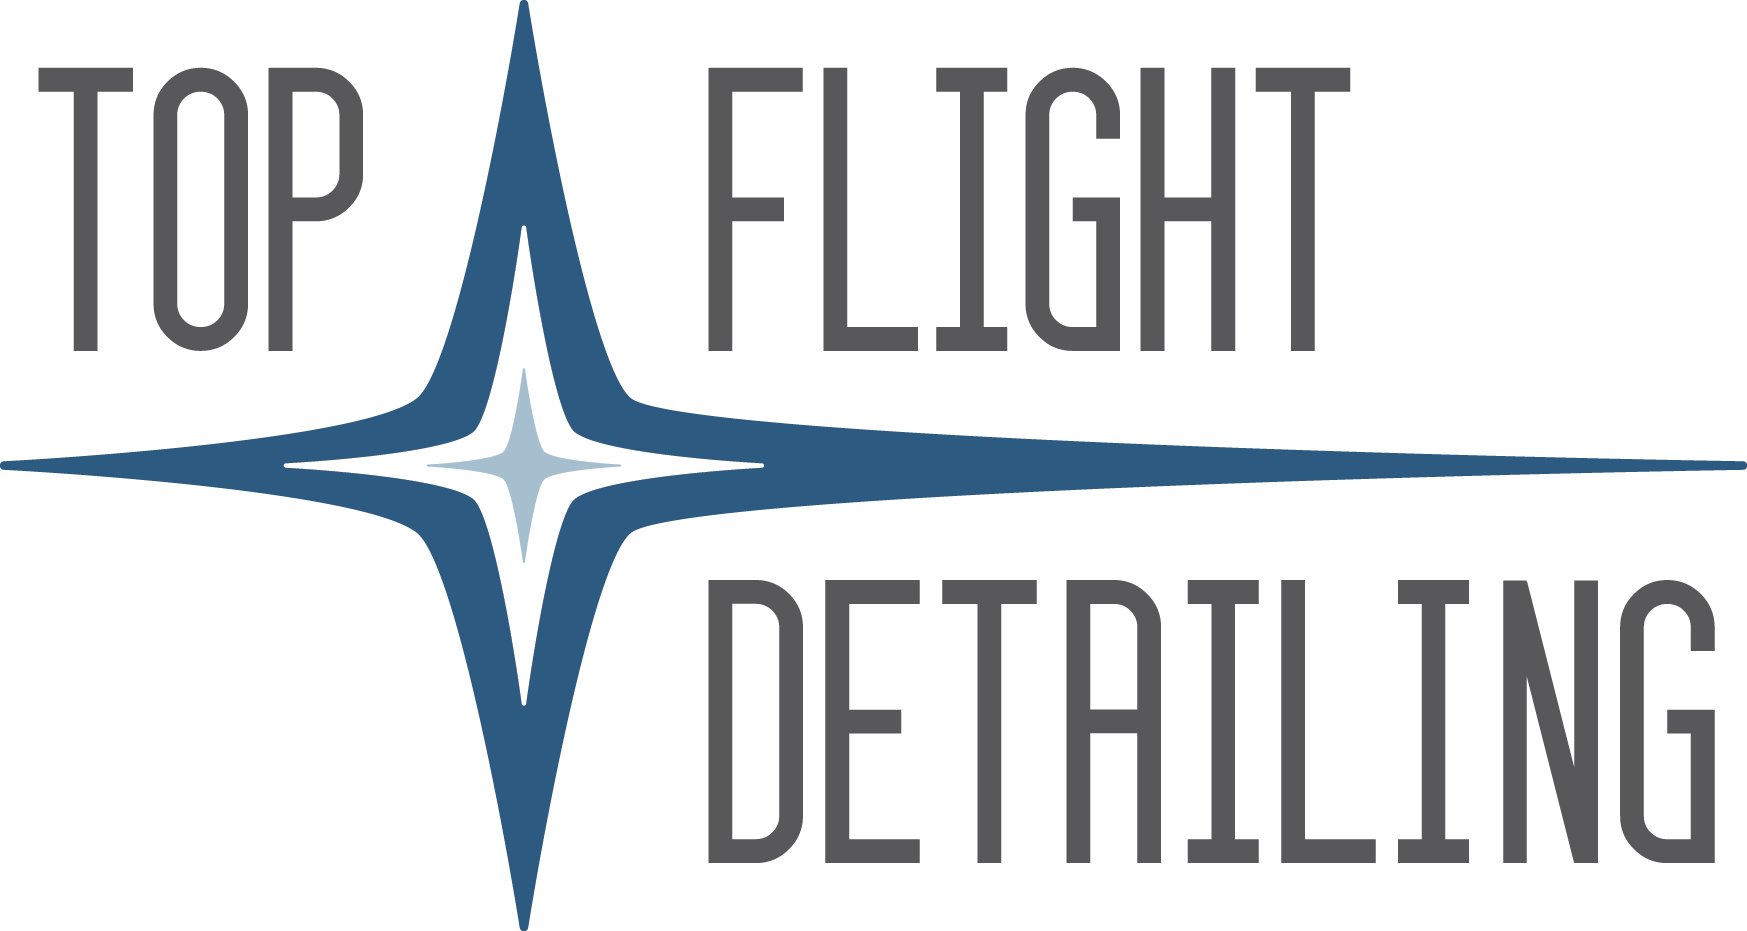 tfd_color_logo.png